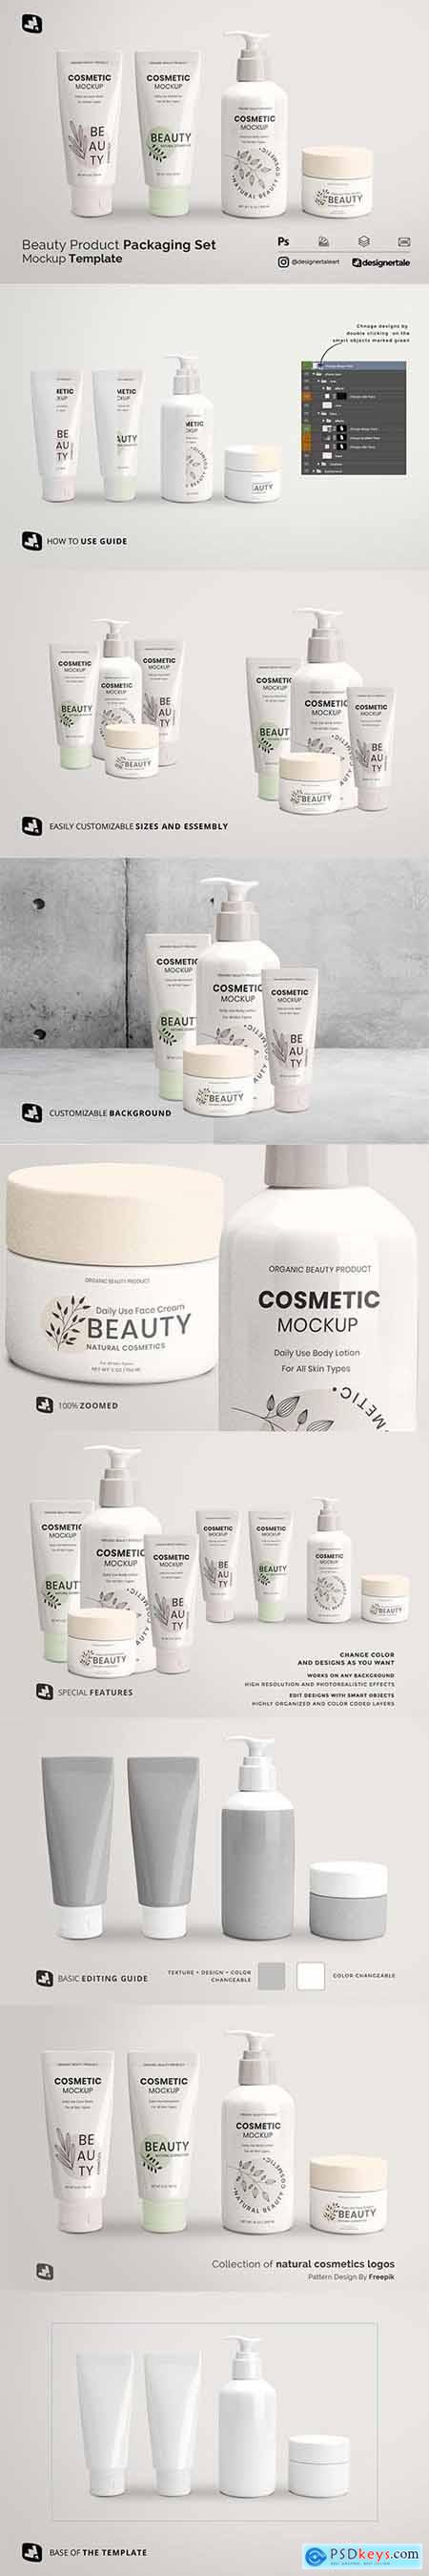 Beauty Product Packaging Set Mockup 5251048